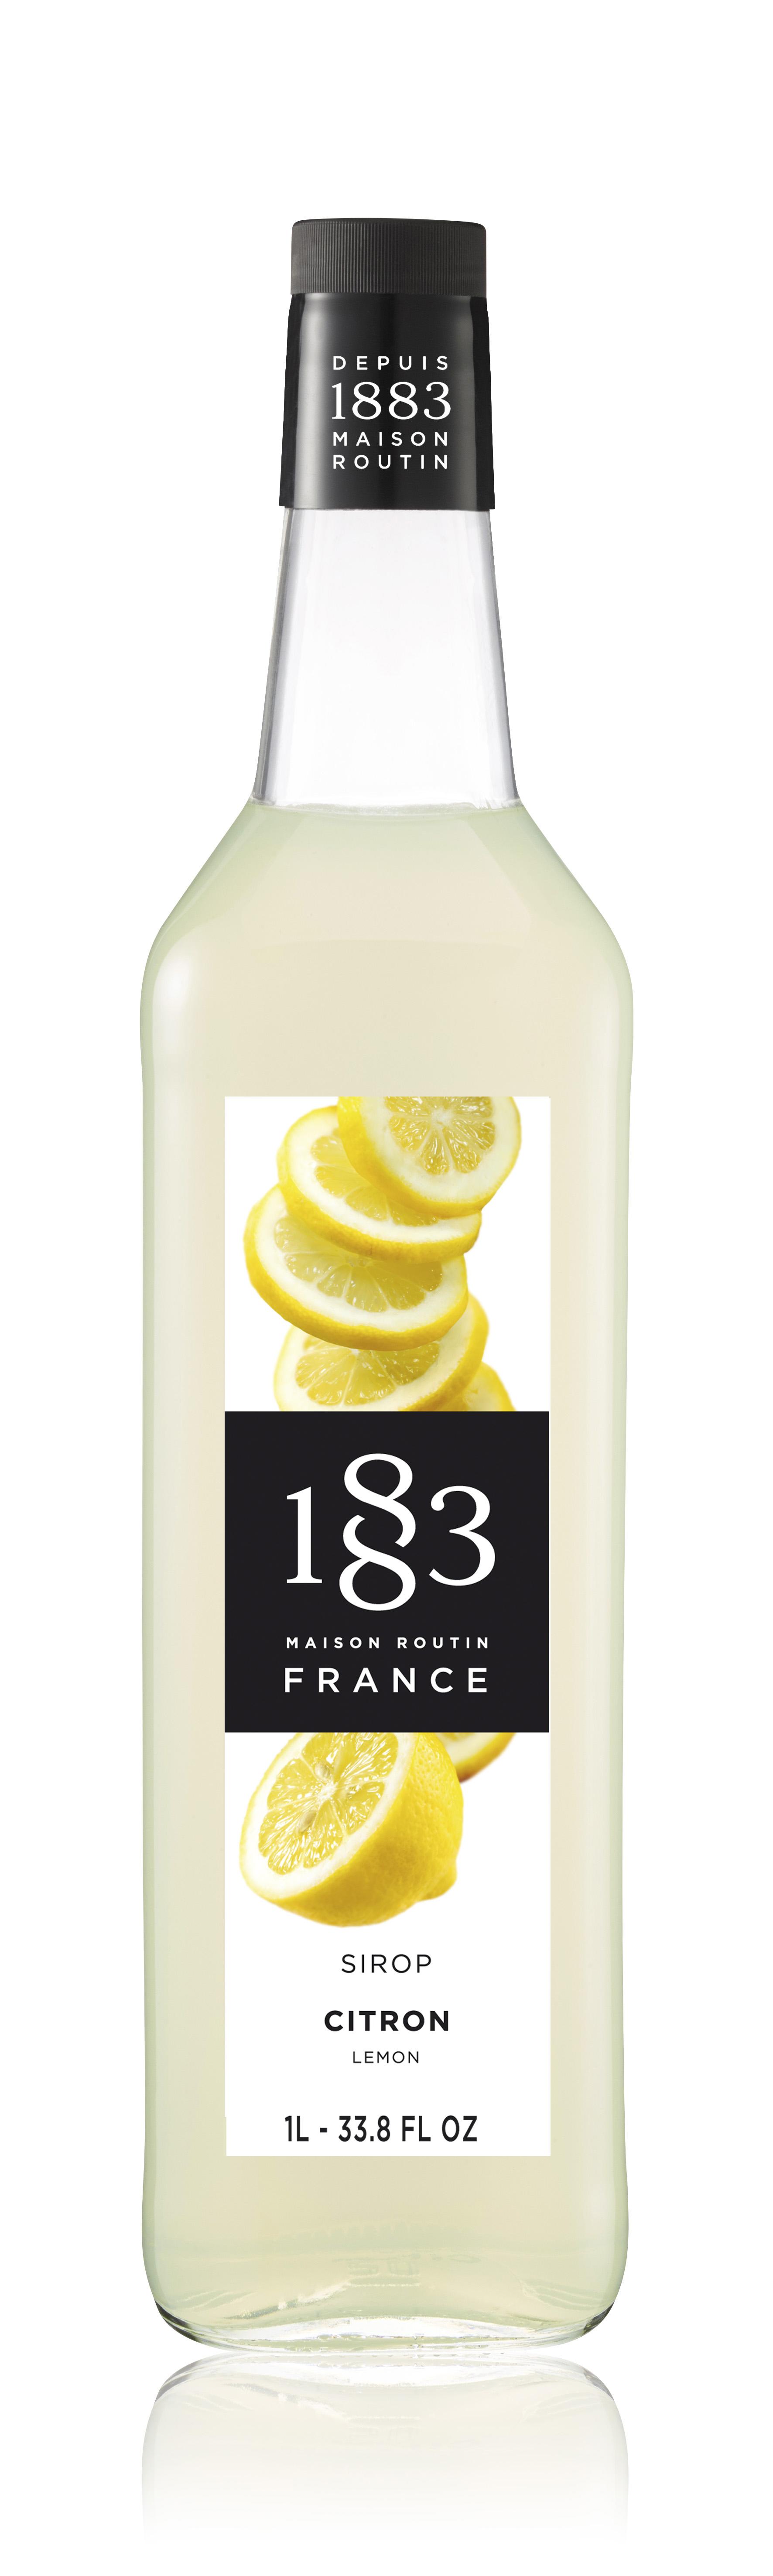 1883 Syrup Lemon 1L Glass Bottle